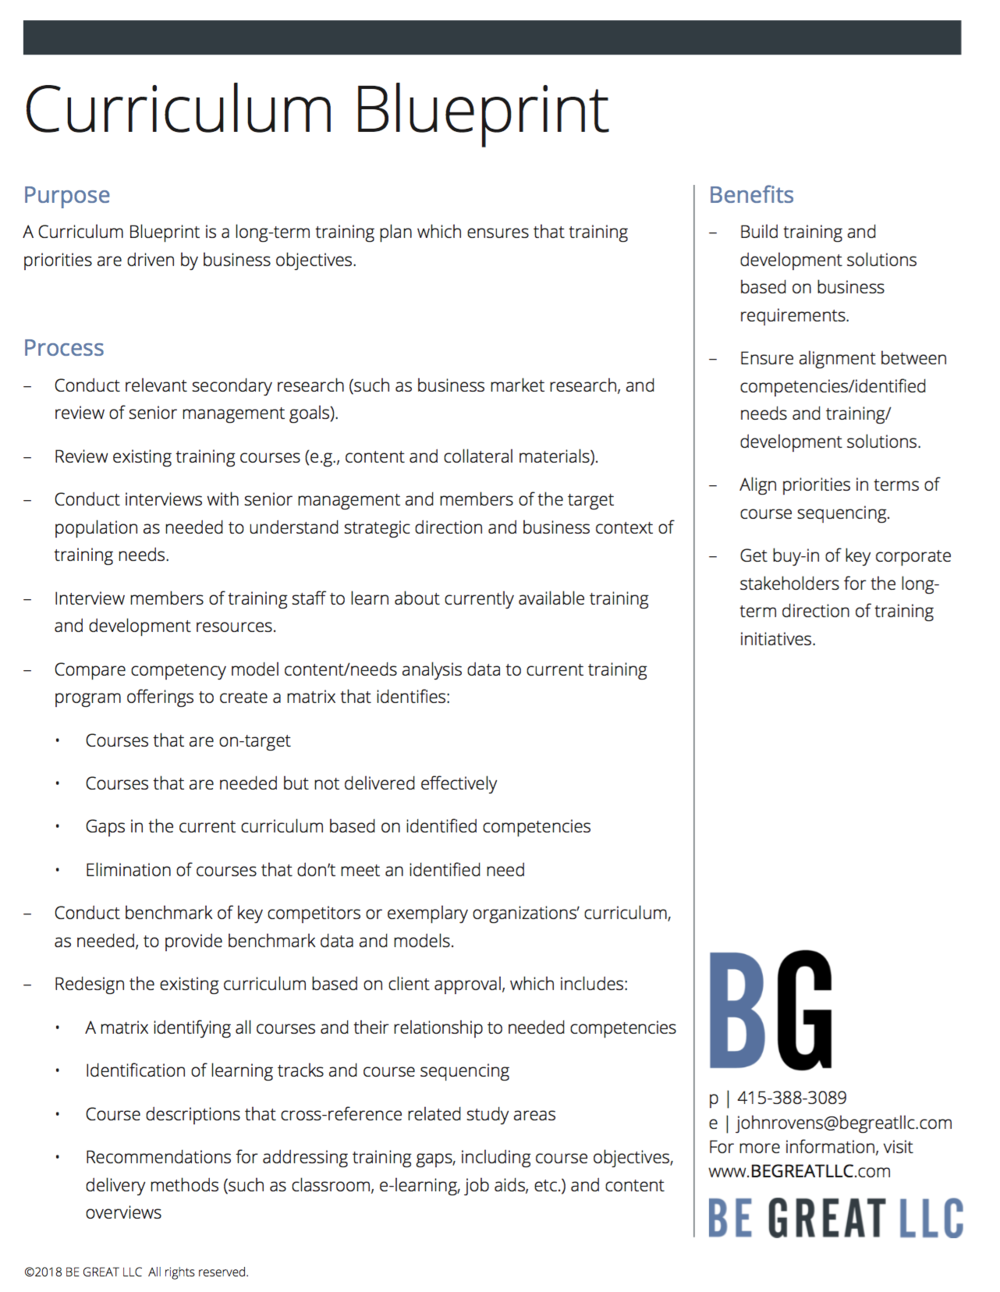 Curriculum Blueprint.png